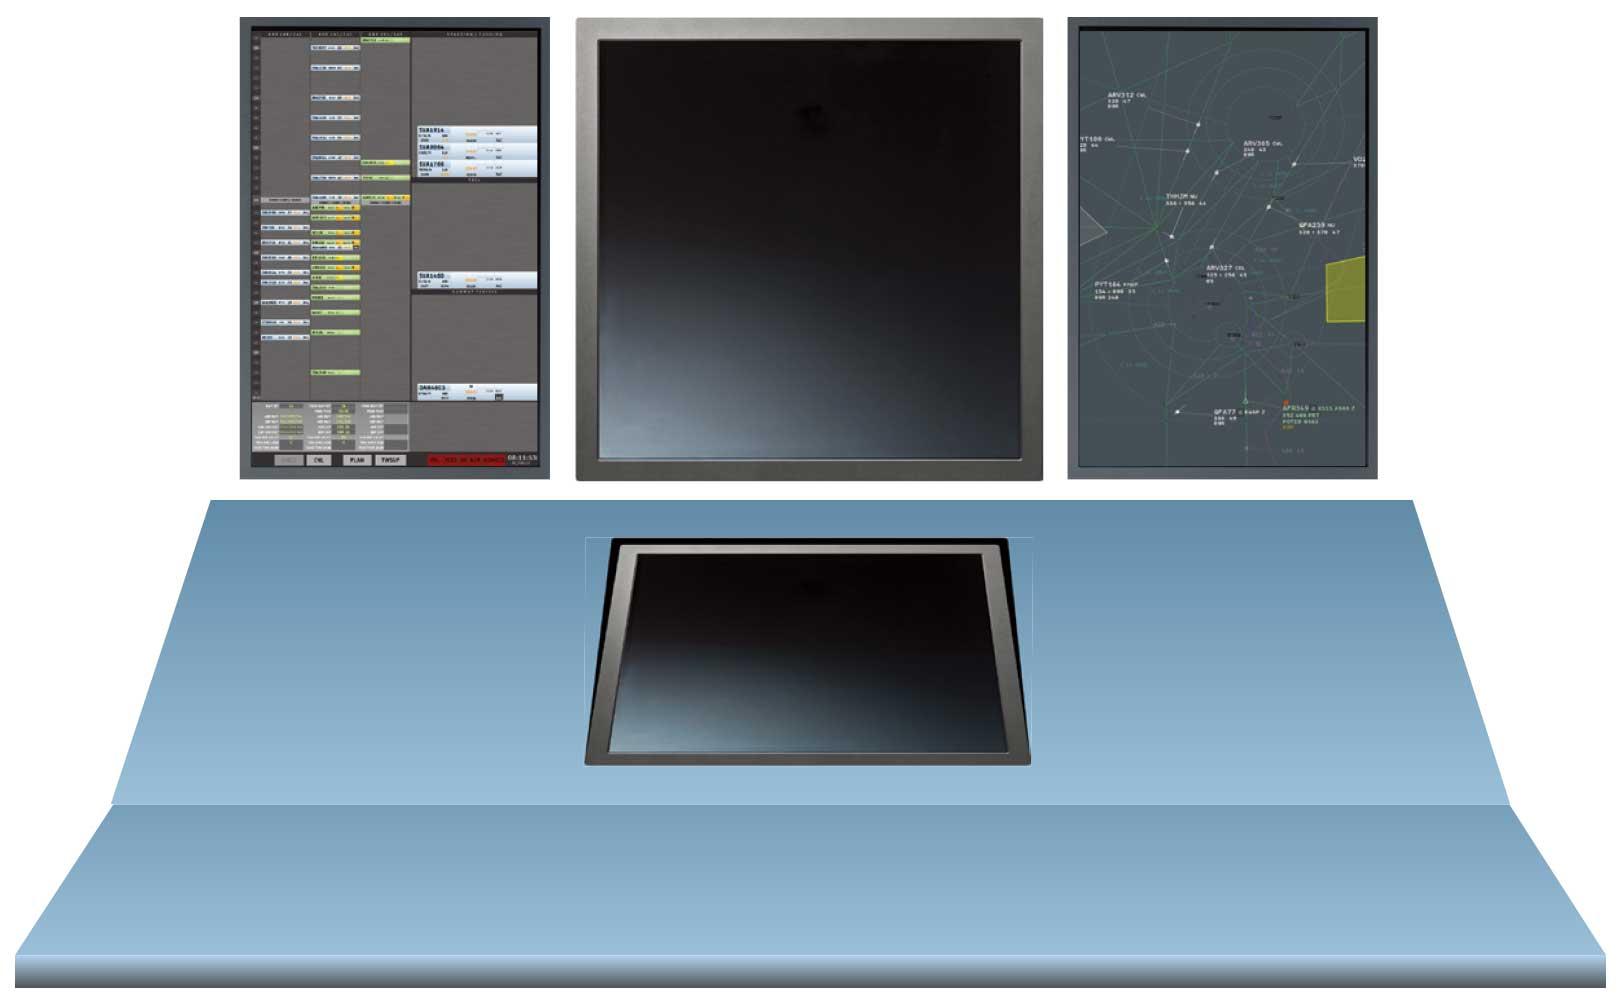 auxiliary monitors